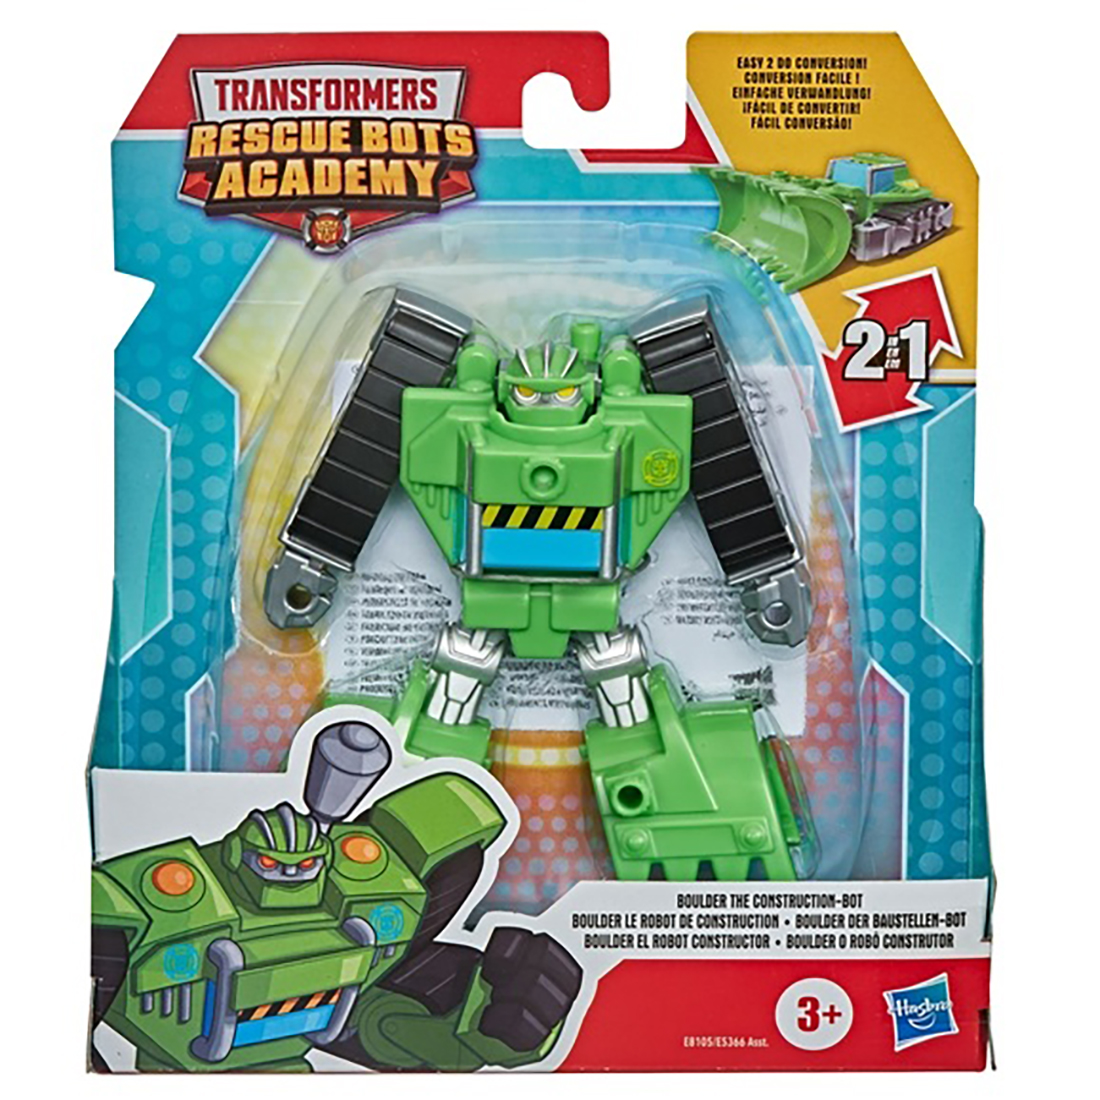 Figurina Transformers Rescue Bots Academy, Boulder to Bulldozer, E8105